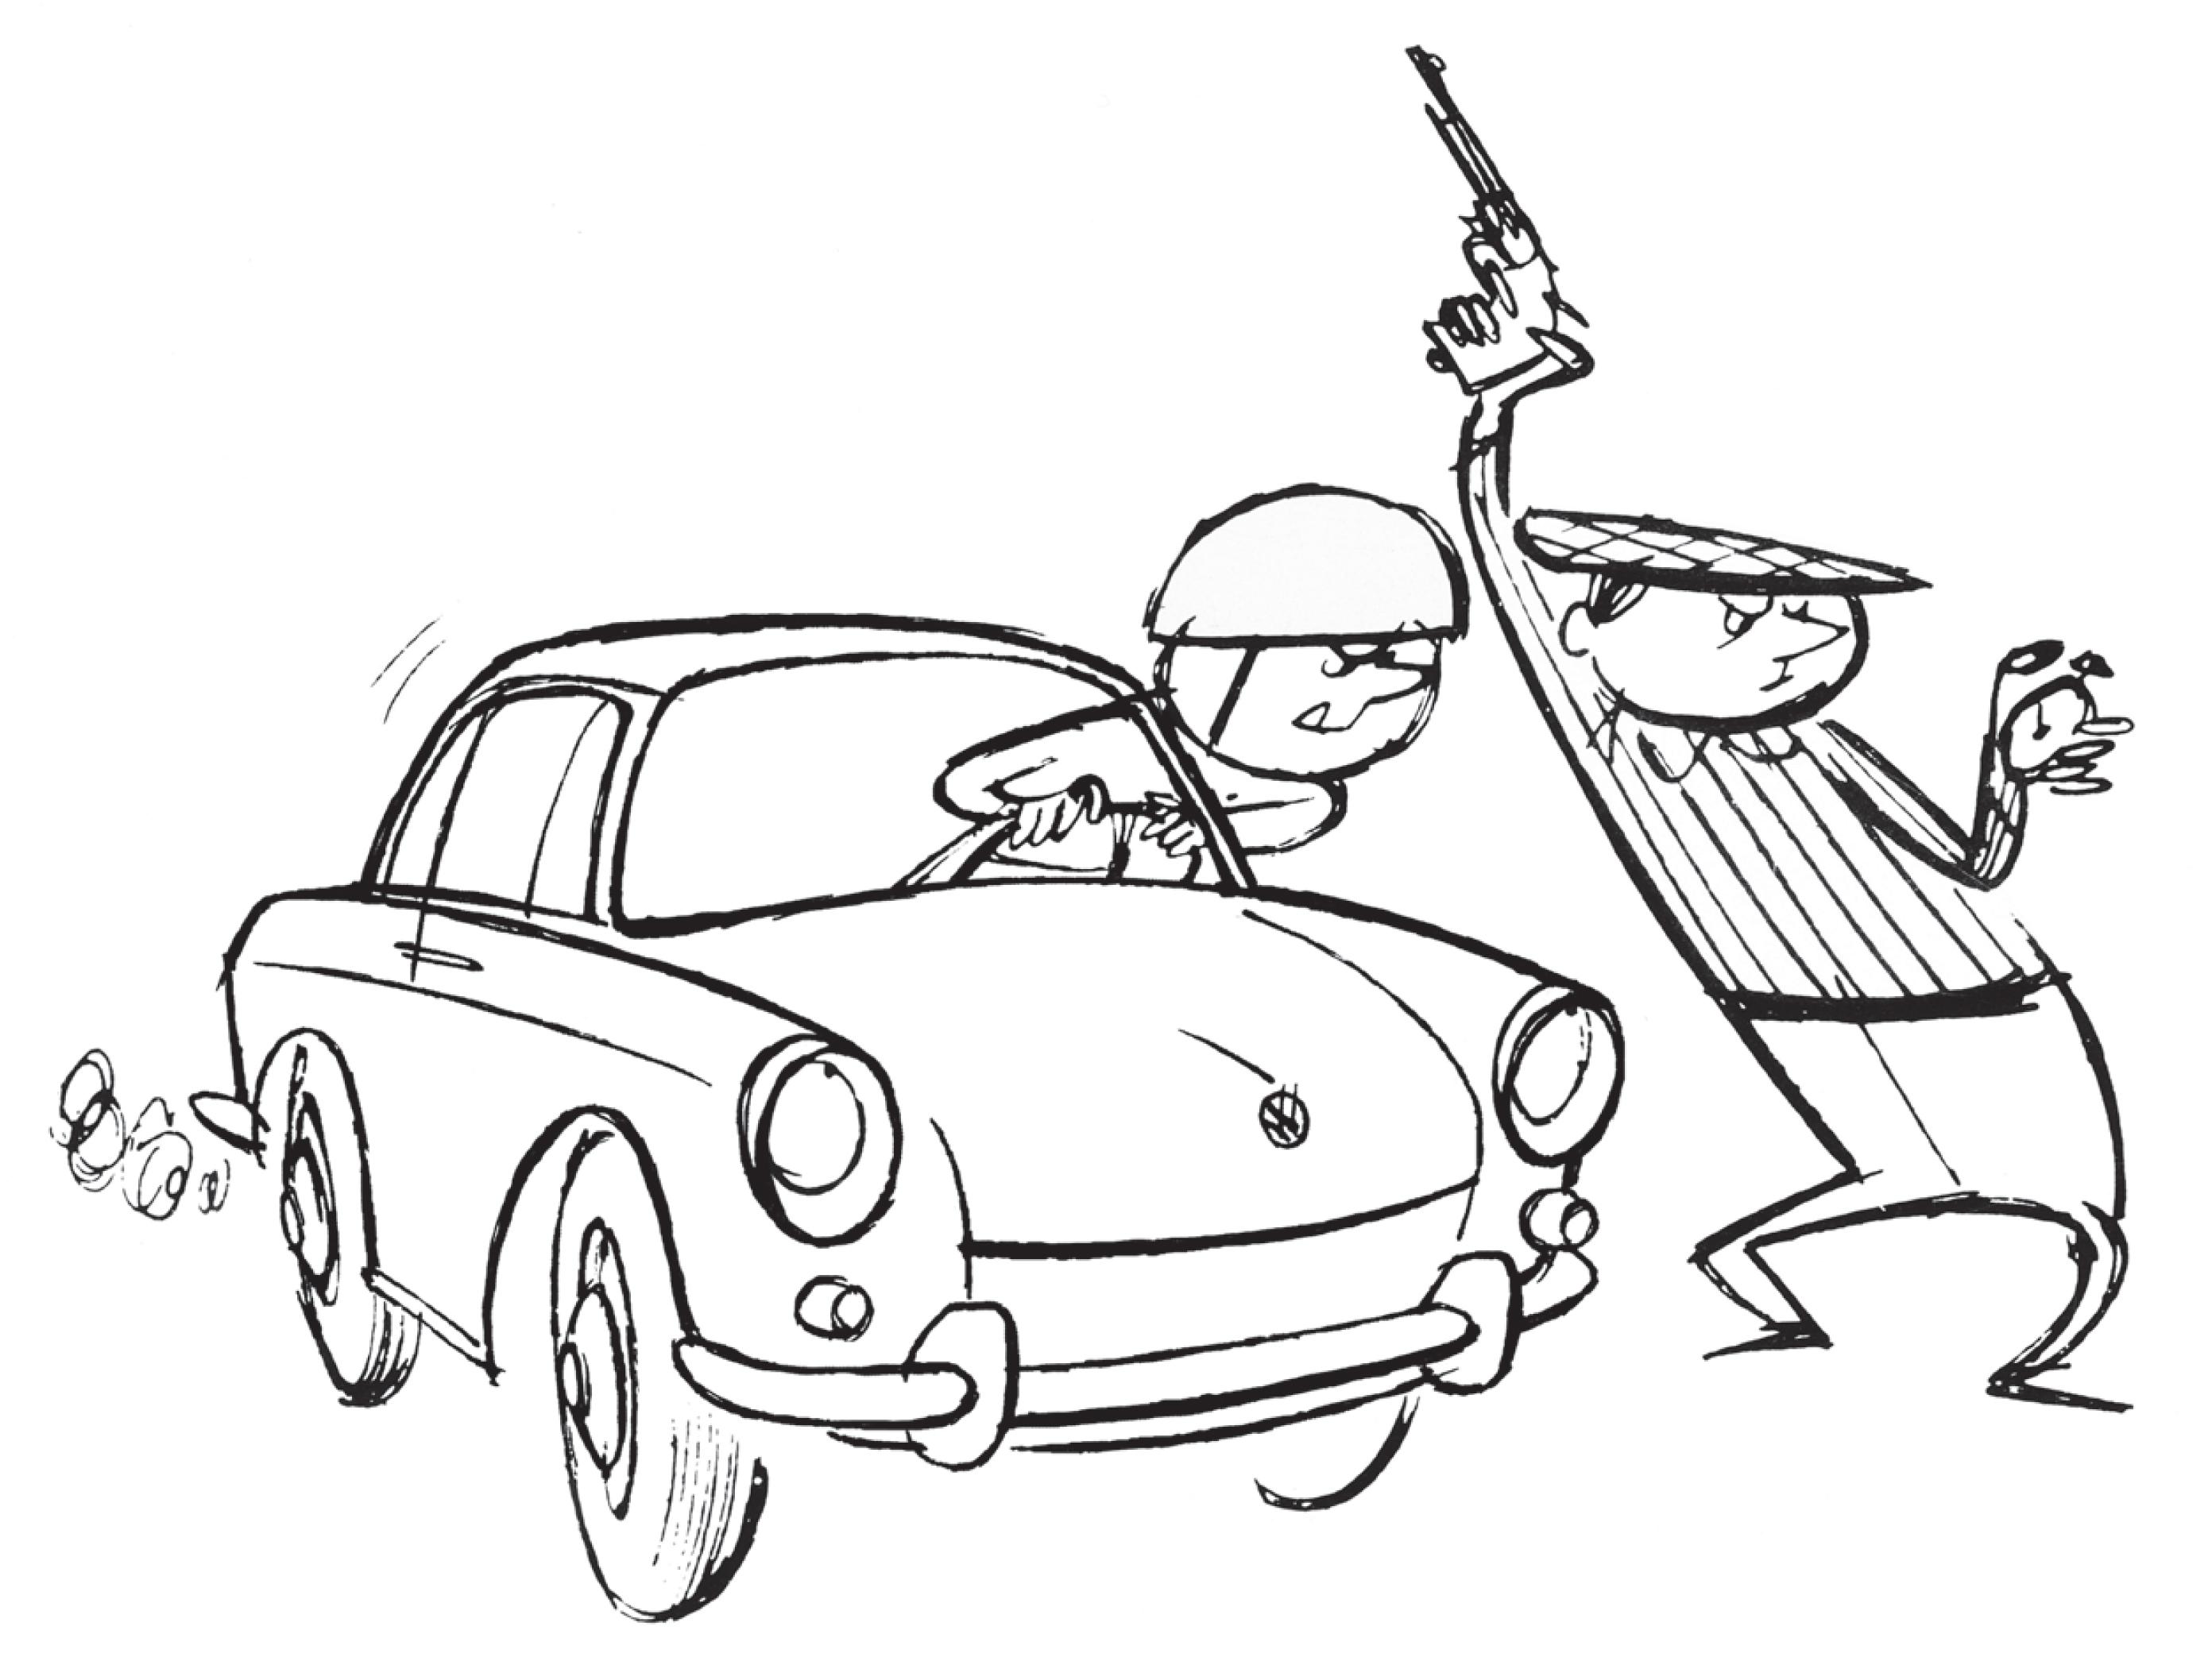 t3rally-cartoon.jpg